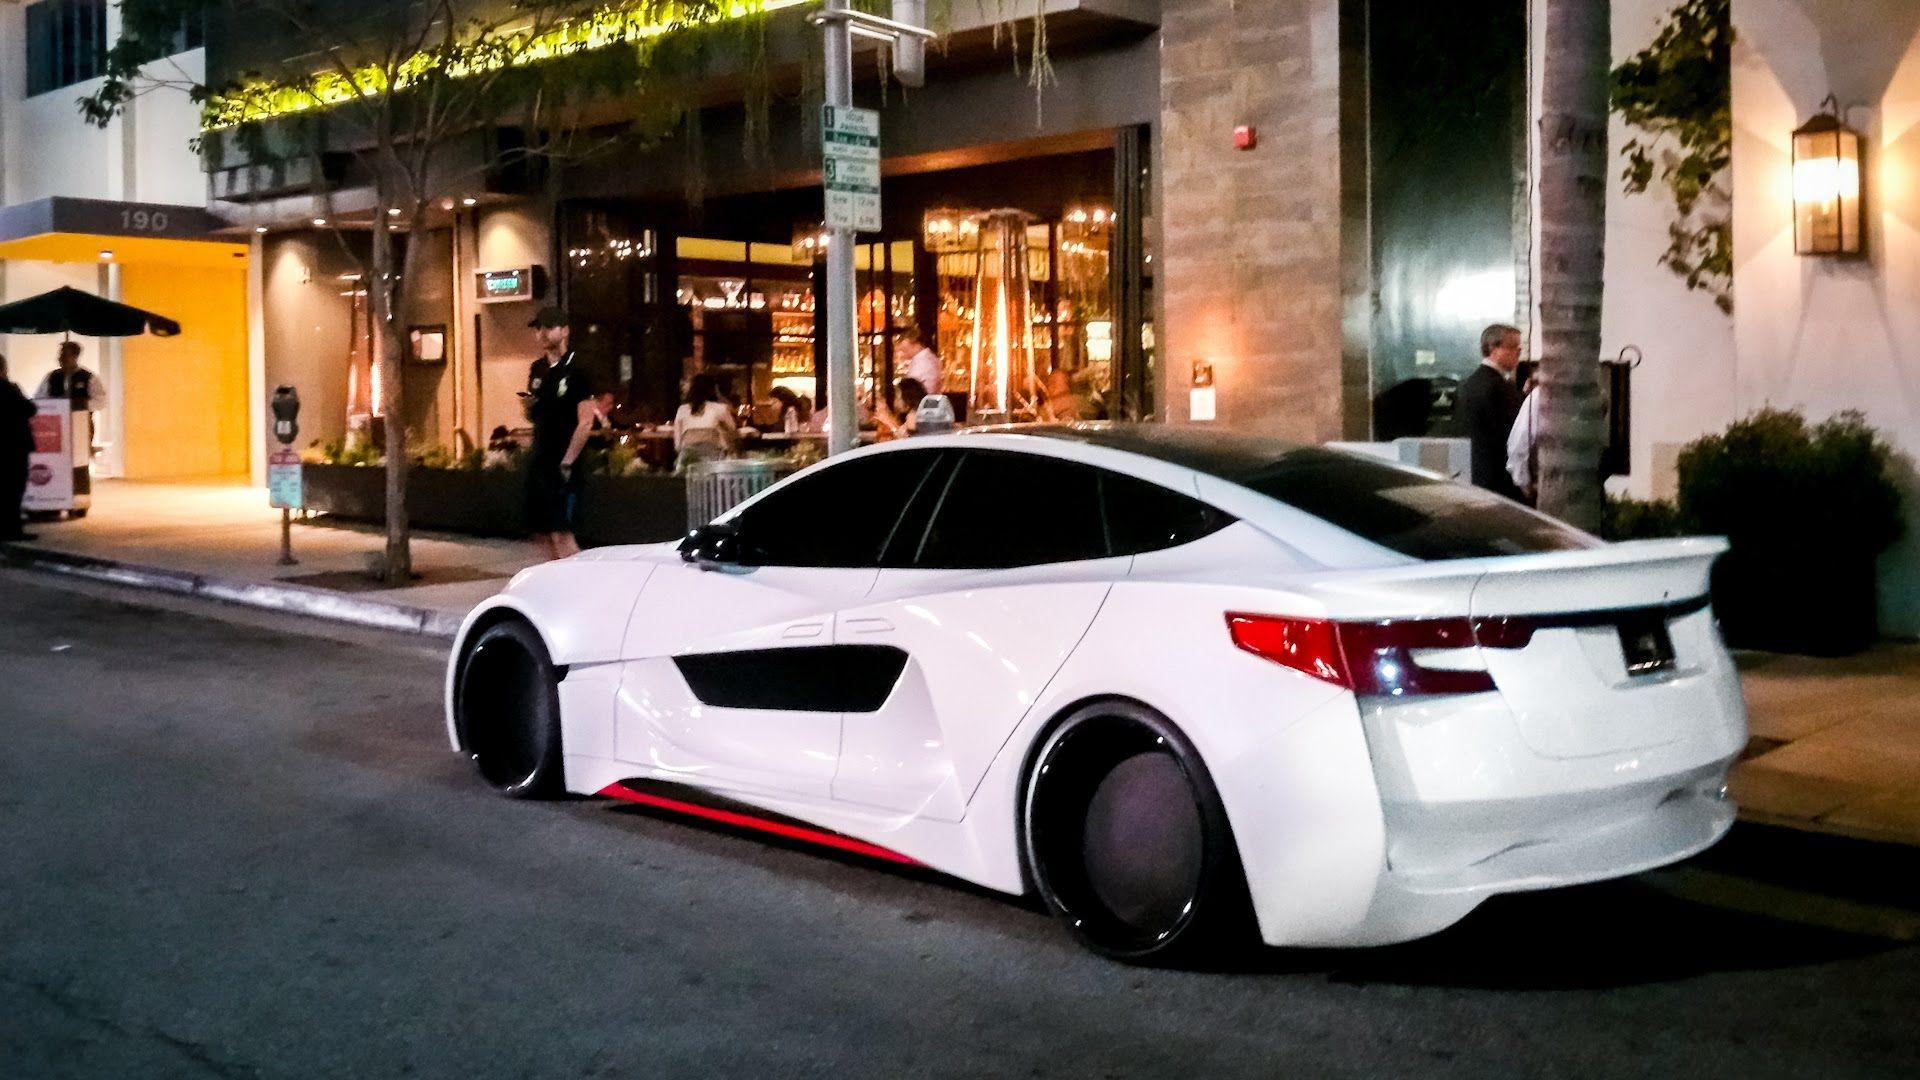 Will I Ams Fugly Tesla Tesla Models Car Automotive Cars